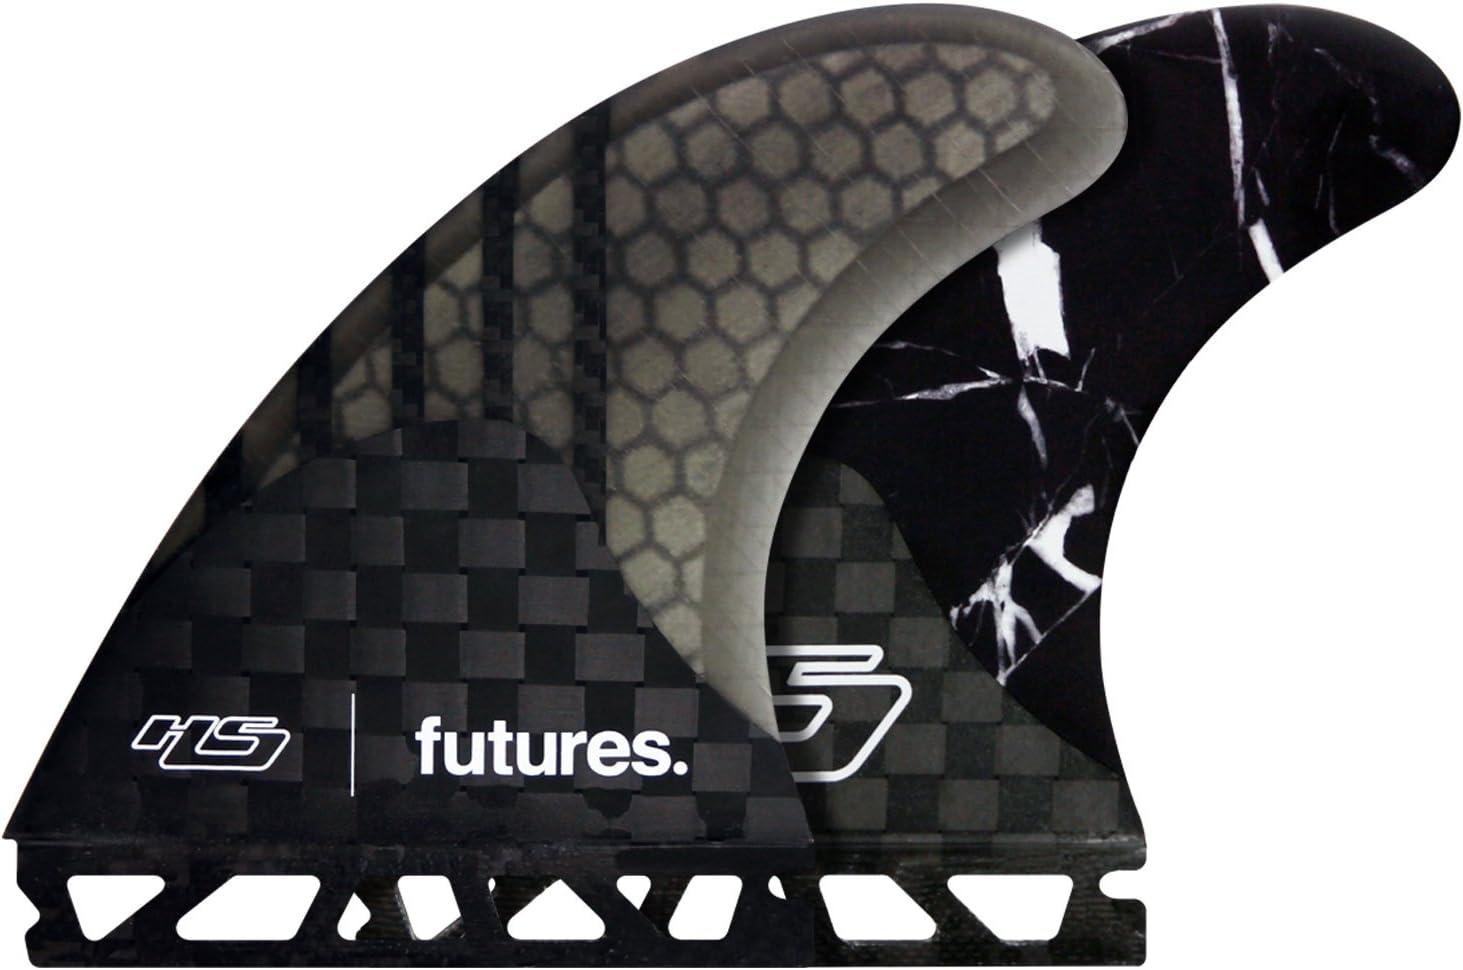 Futures Miami Mall Fins - HS1 Haydenshapes depot Generation Series